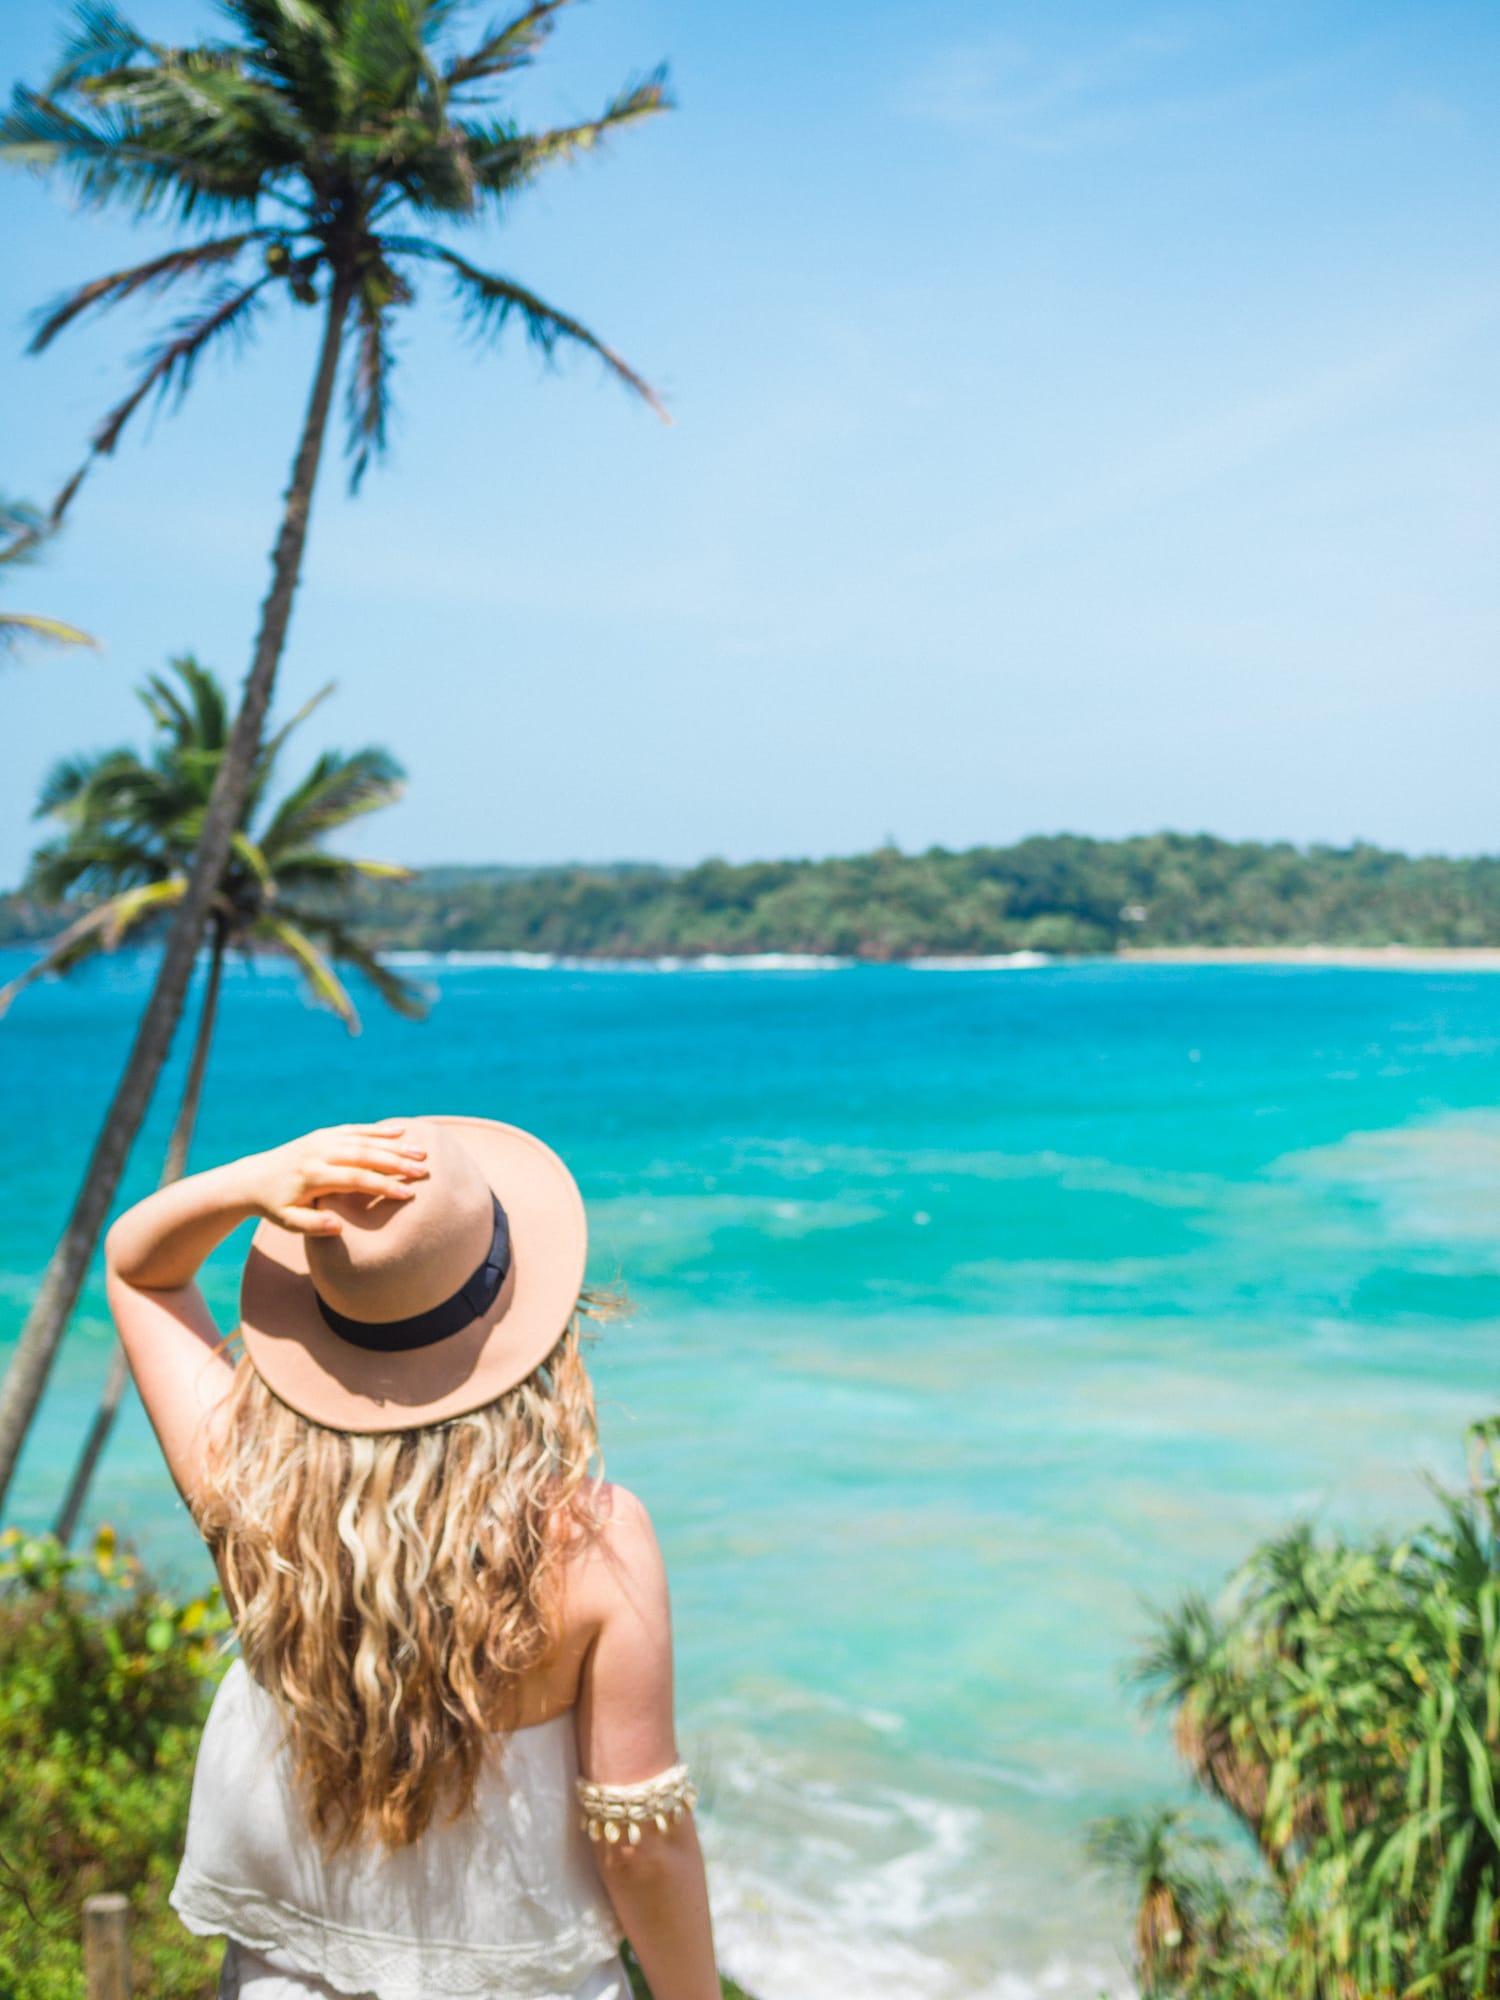 Favorite travel photos of 2016 - Talalla Beach, Sri Lanka